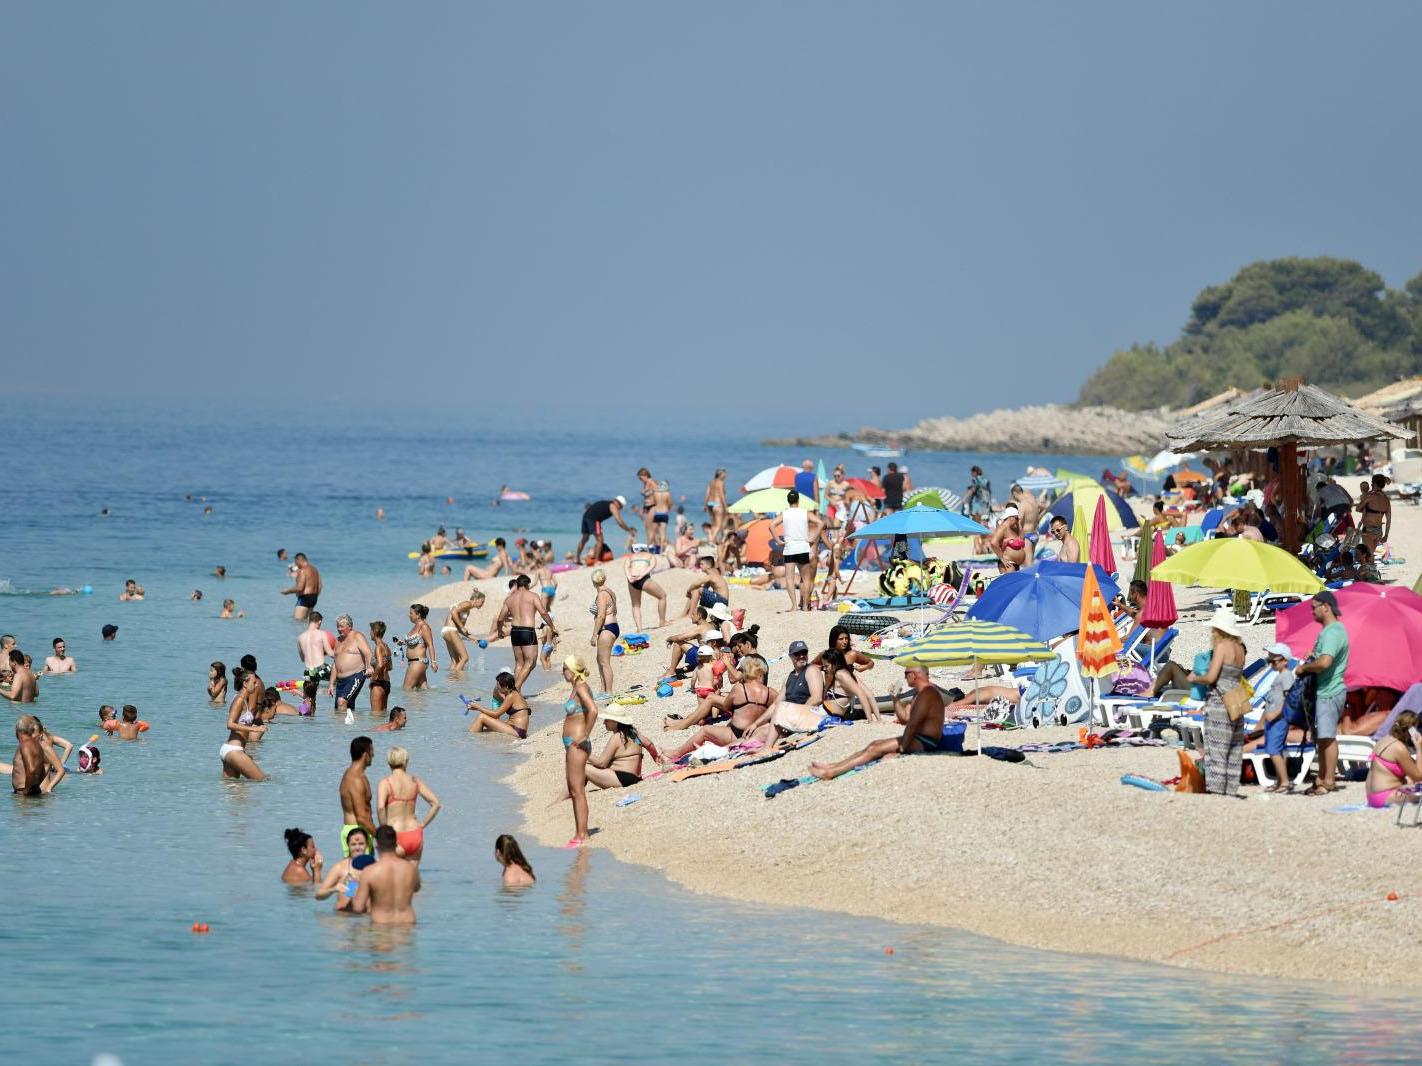 Morje, Hrvaška